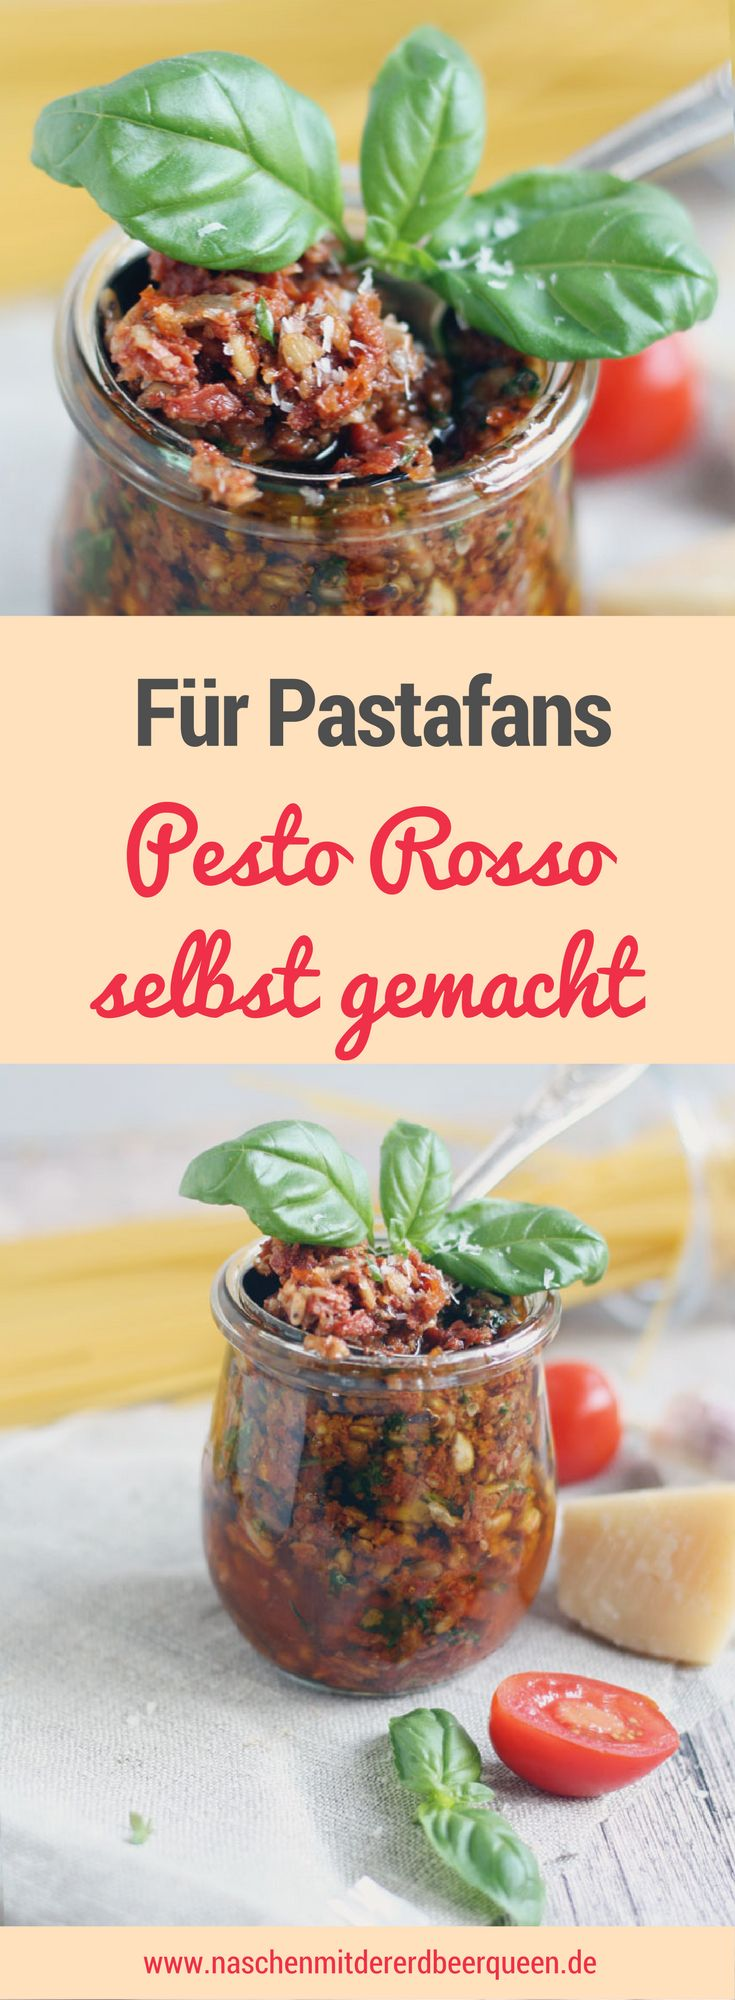 Pesto Rosso Rezept mit Sonnenblumenkernen Basilikum und Thymian - Pastarezepte mit Pesto